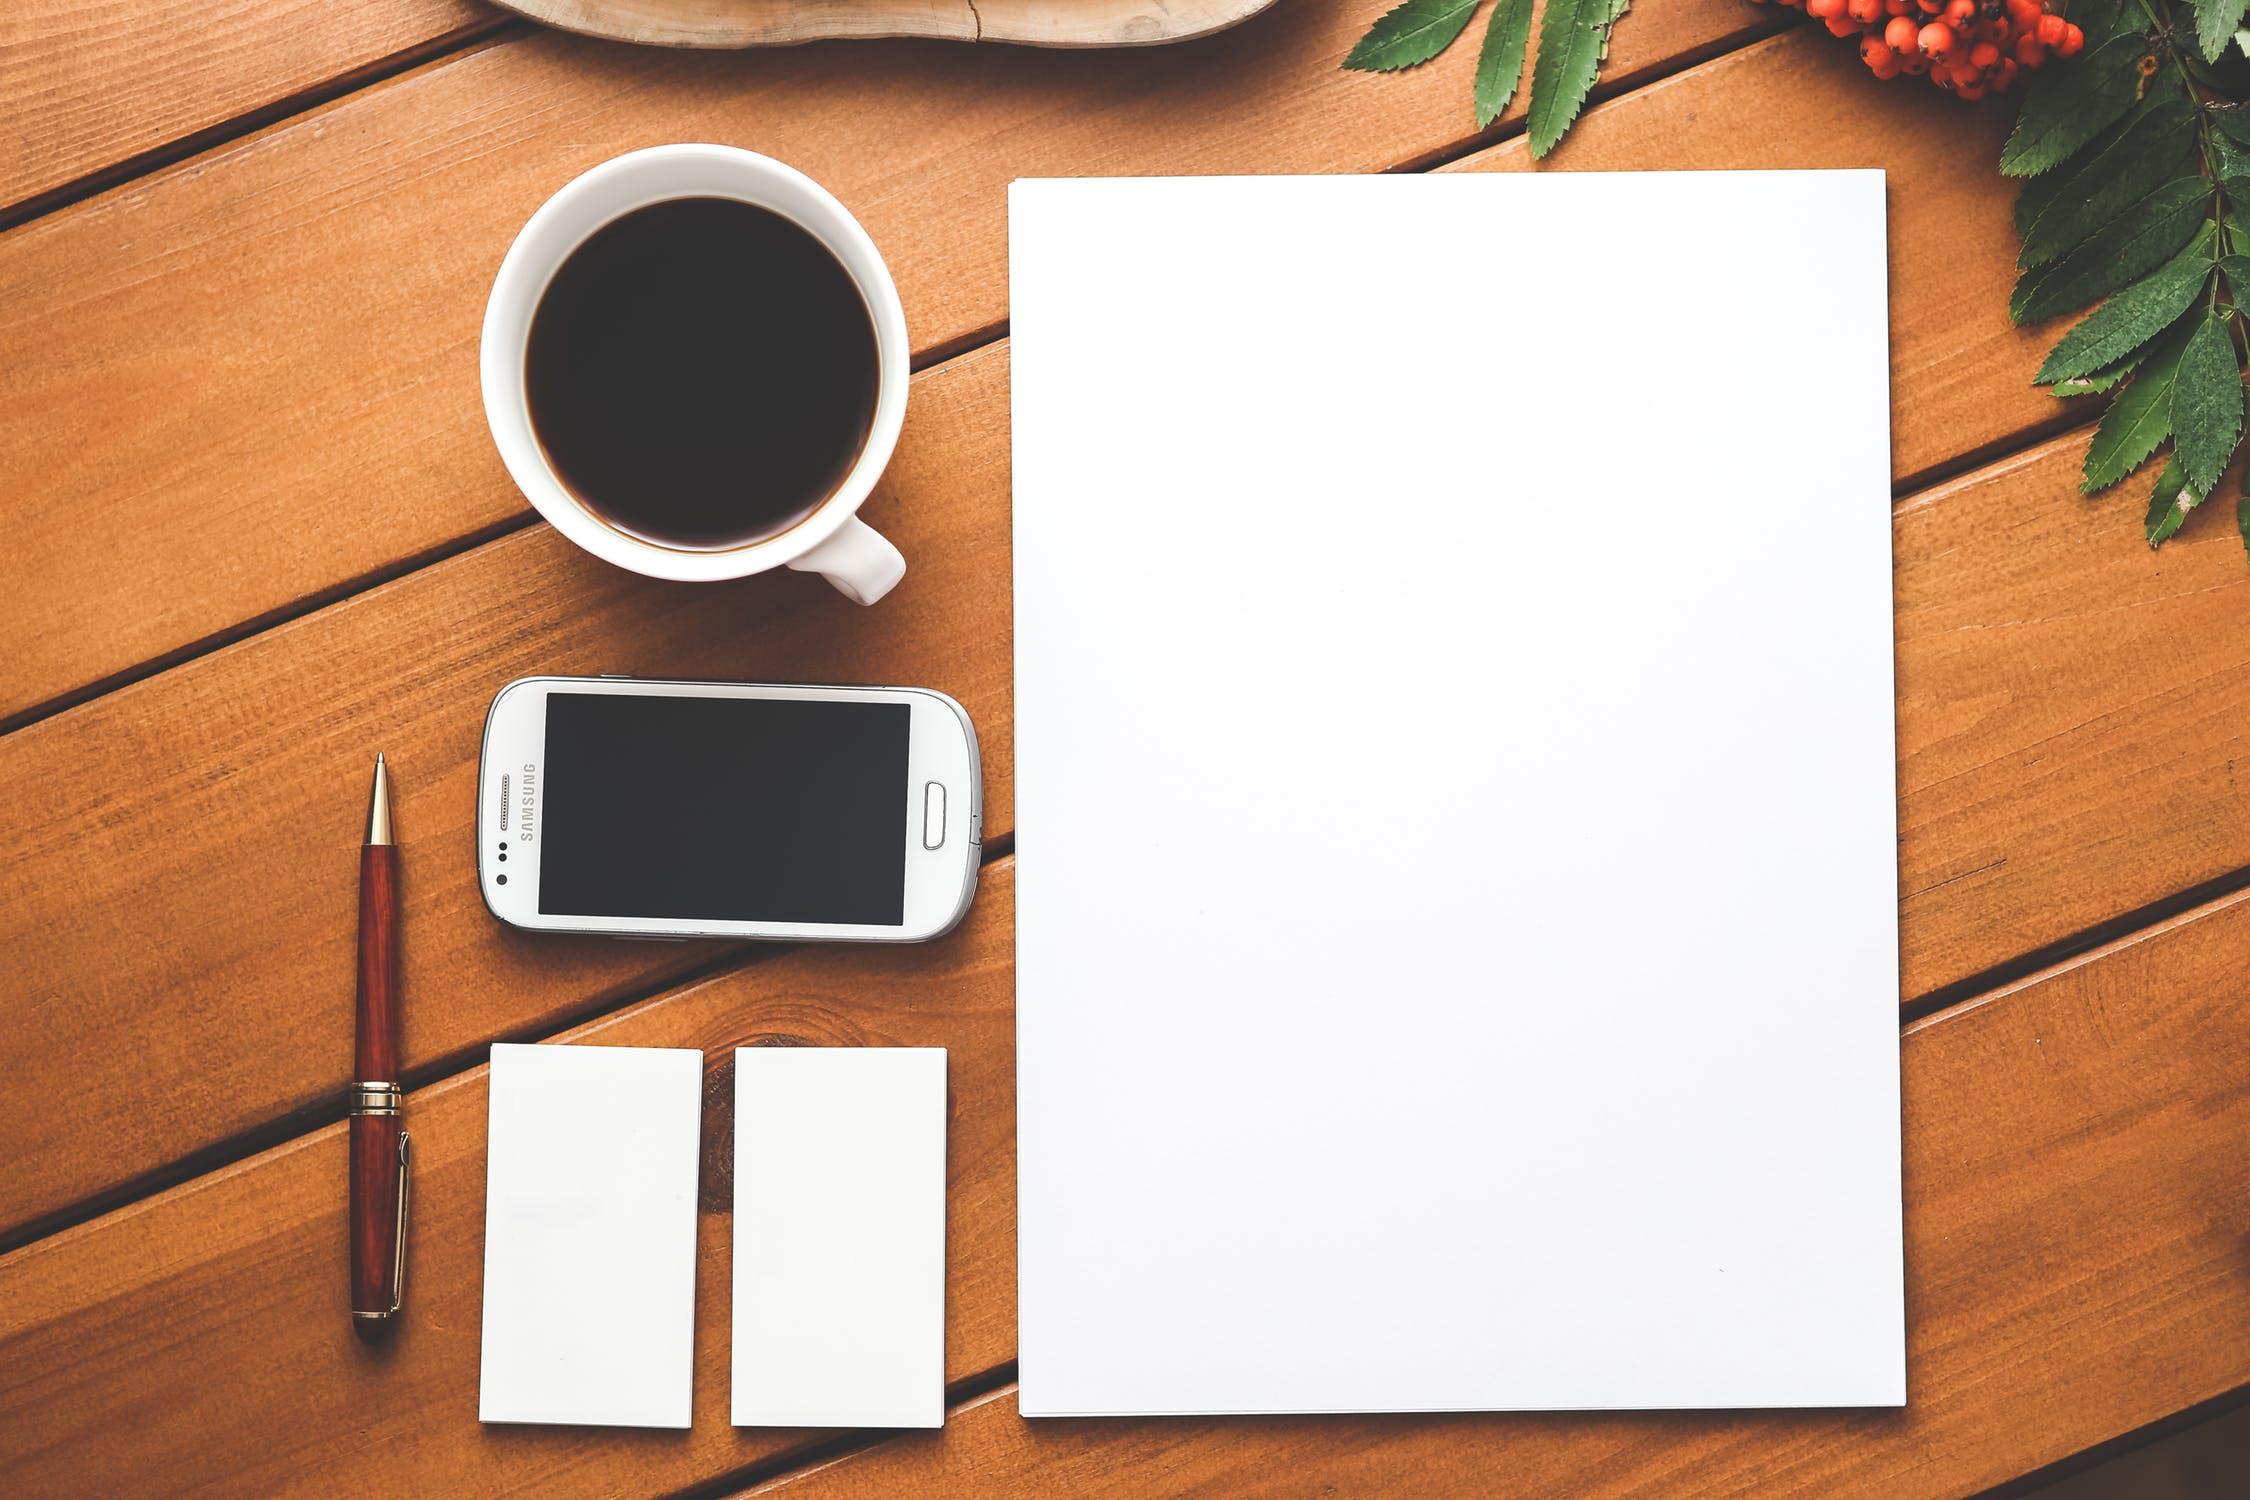 digital marketing and branding startup sharks consultants .jpg